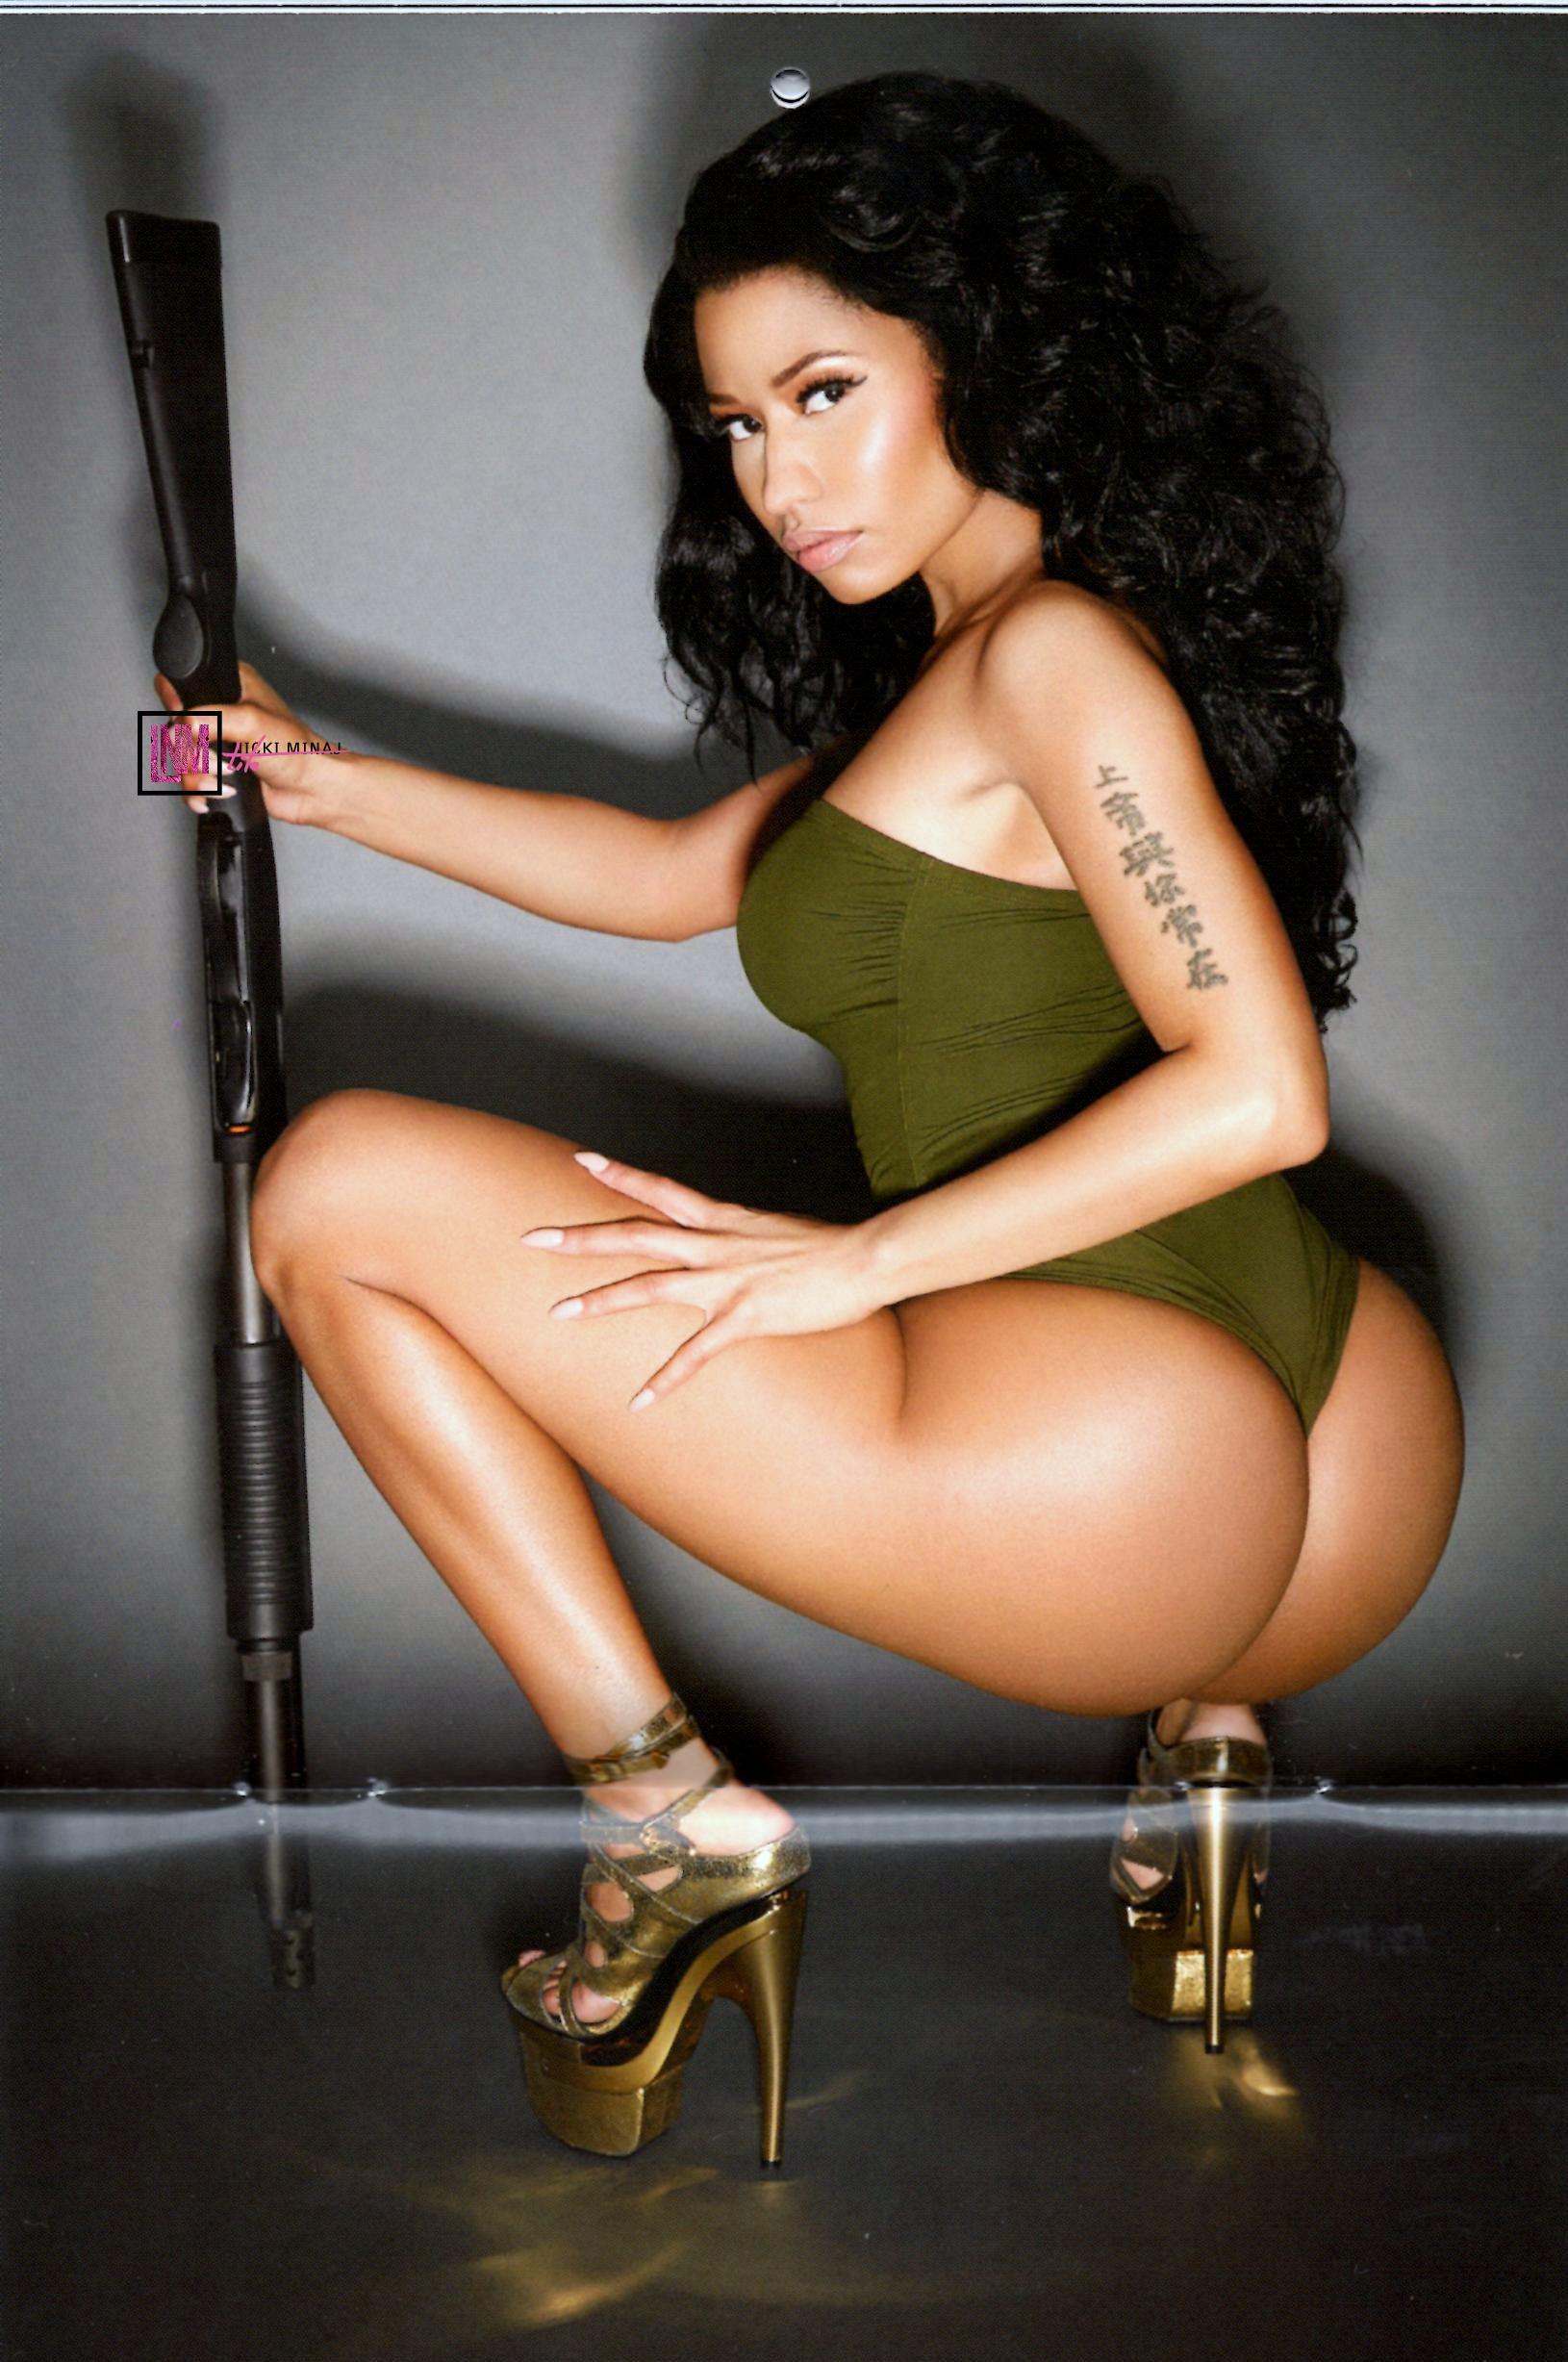 Nicki Minaj Wants All Women to Demand More Orgasms